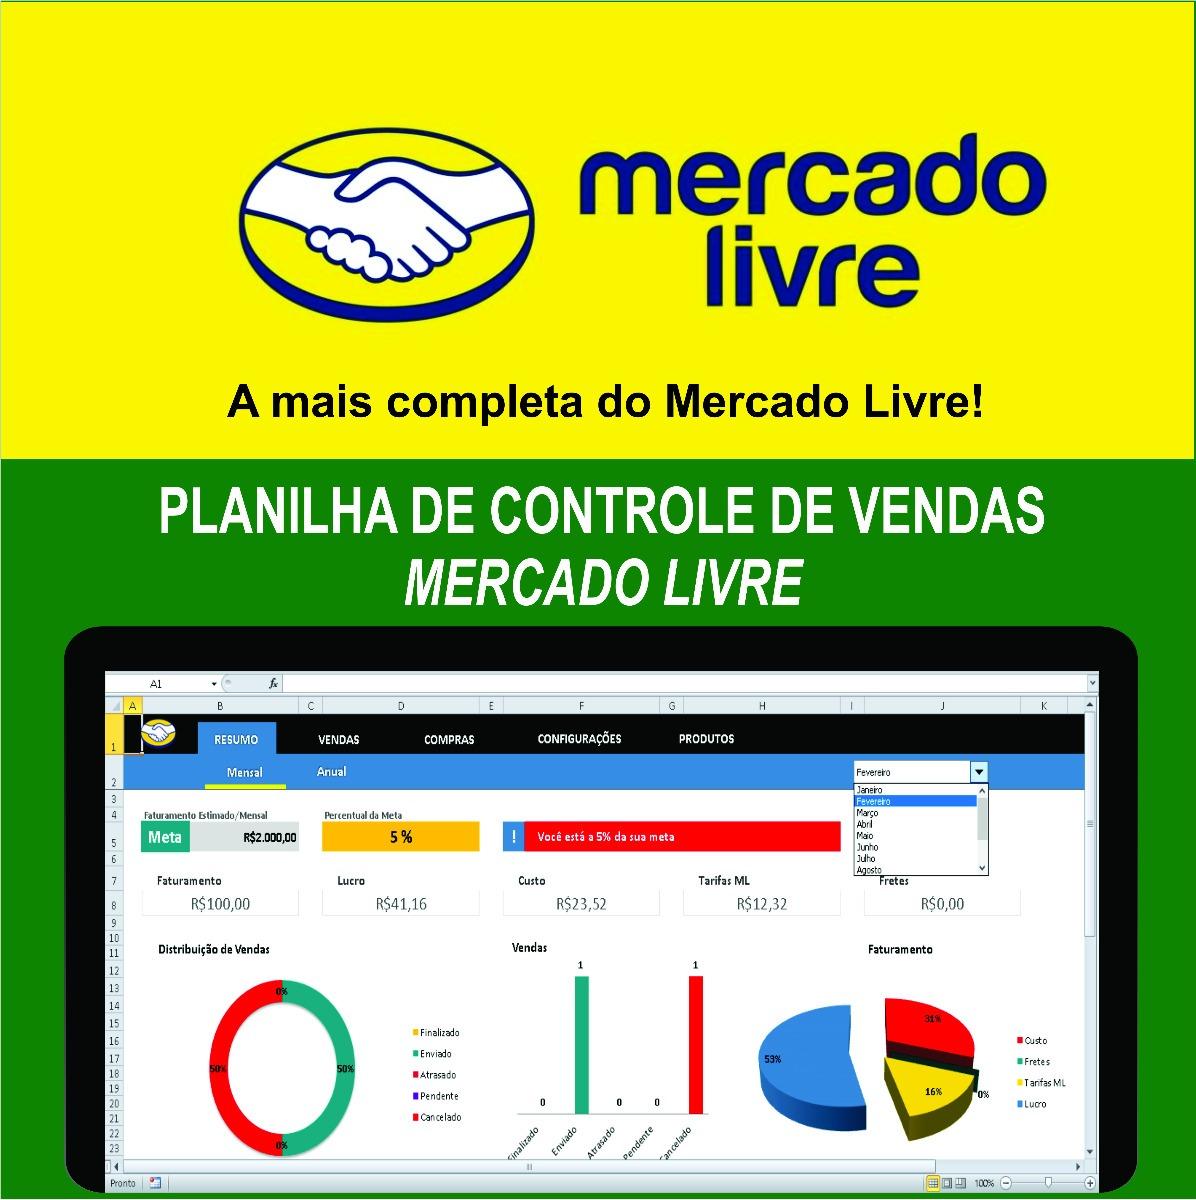 94e49bc1276 Planilha De Controle De Vendas Mercado Livre - R  34